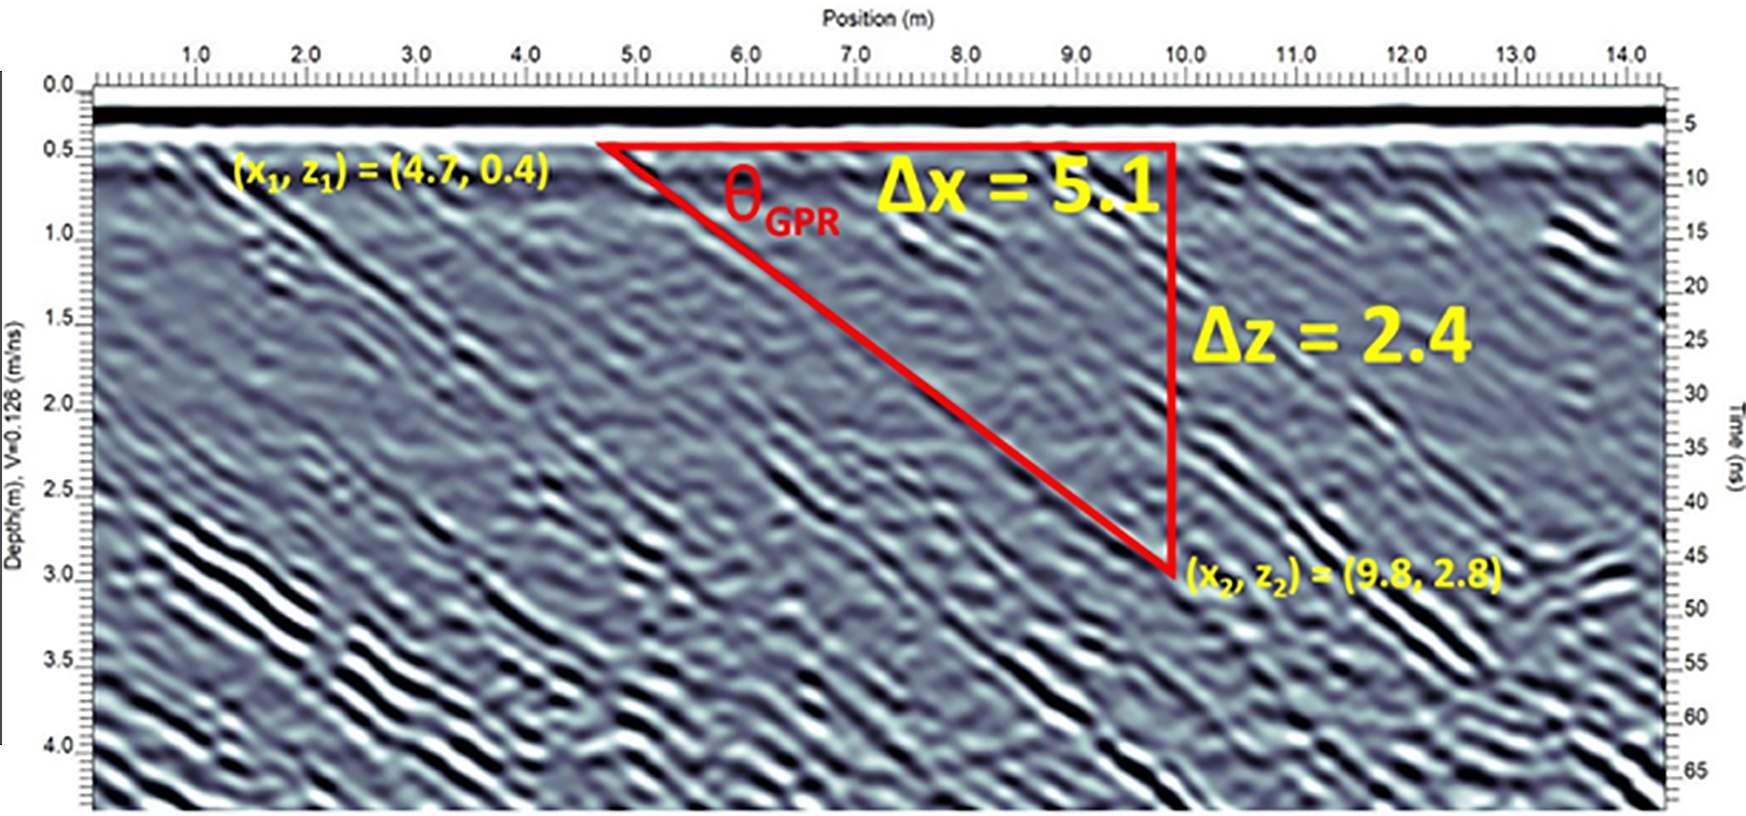 gpr depth calculation